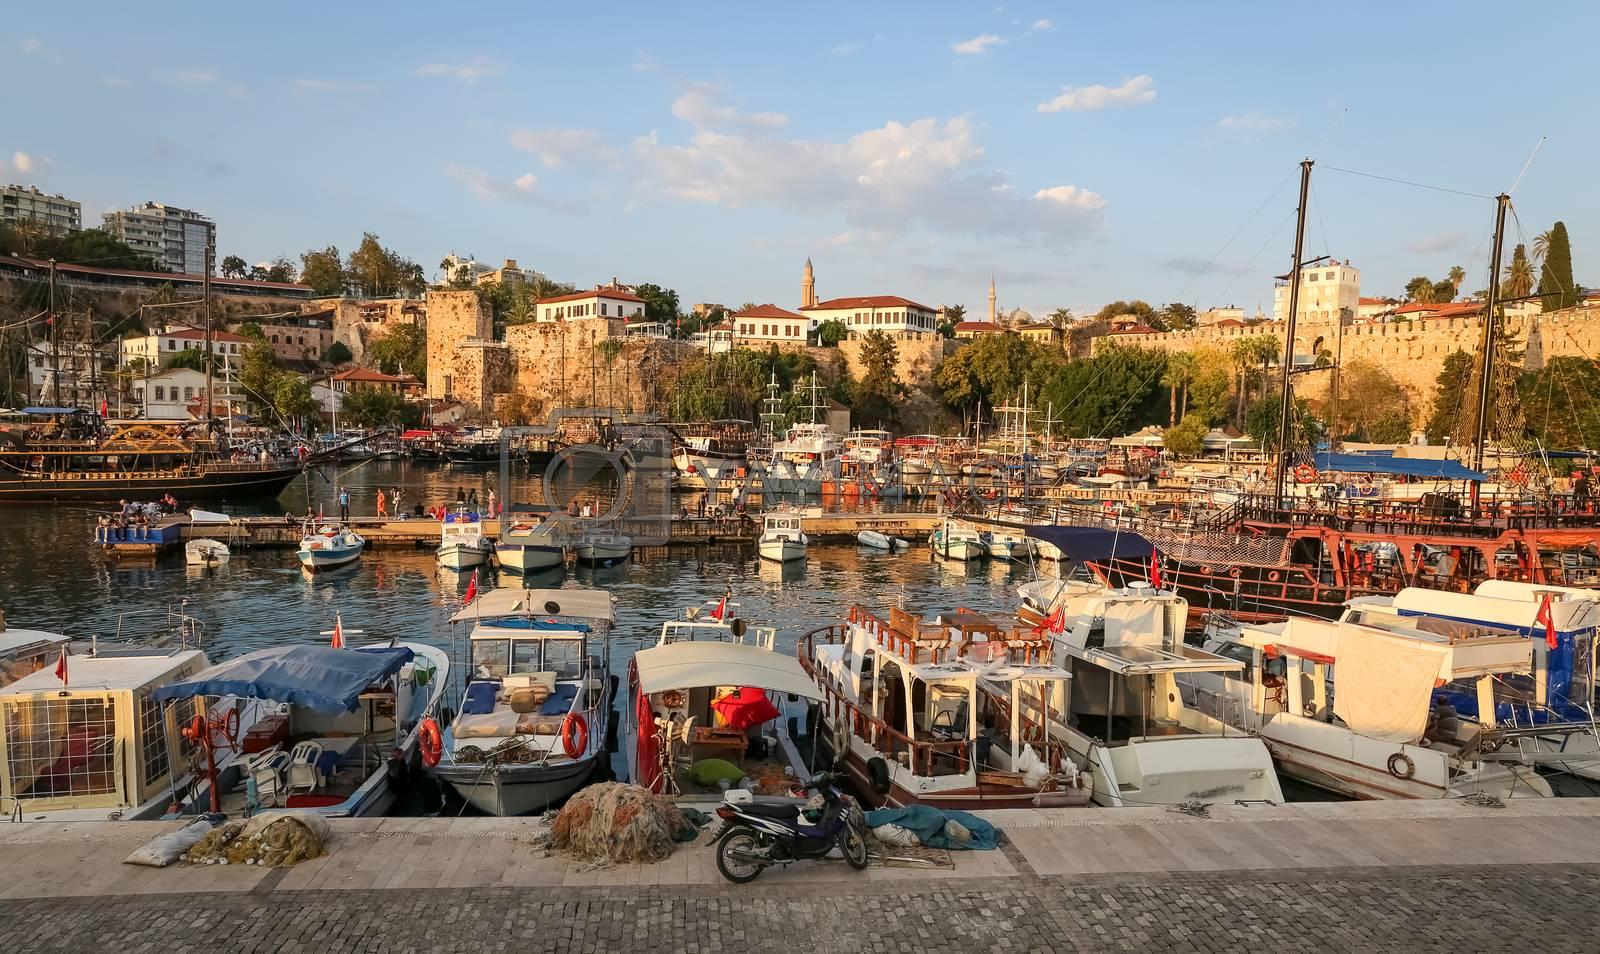 Boats in Antalya Harbour, Turkey by EvrenKalinbacak